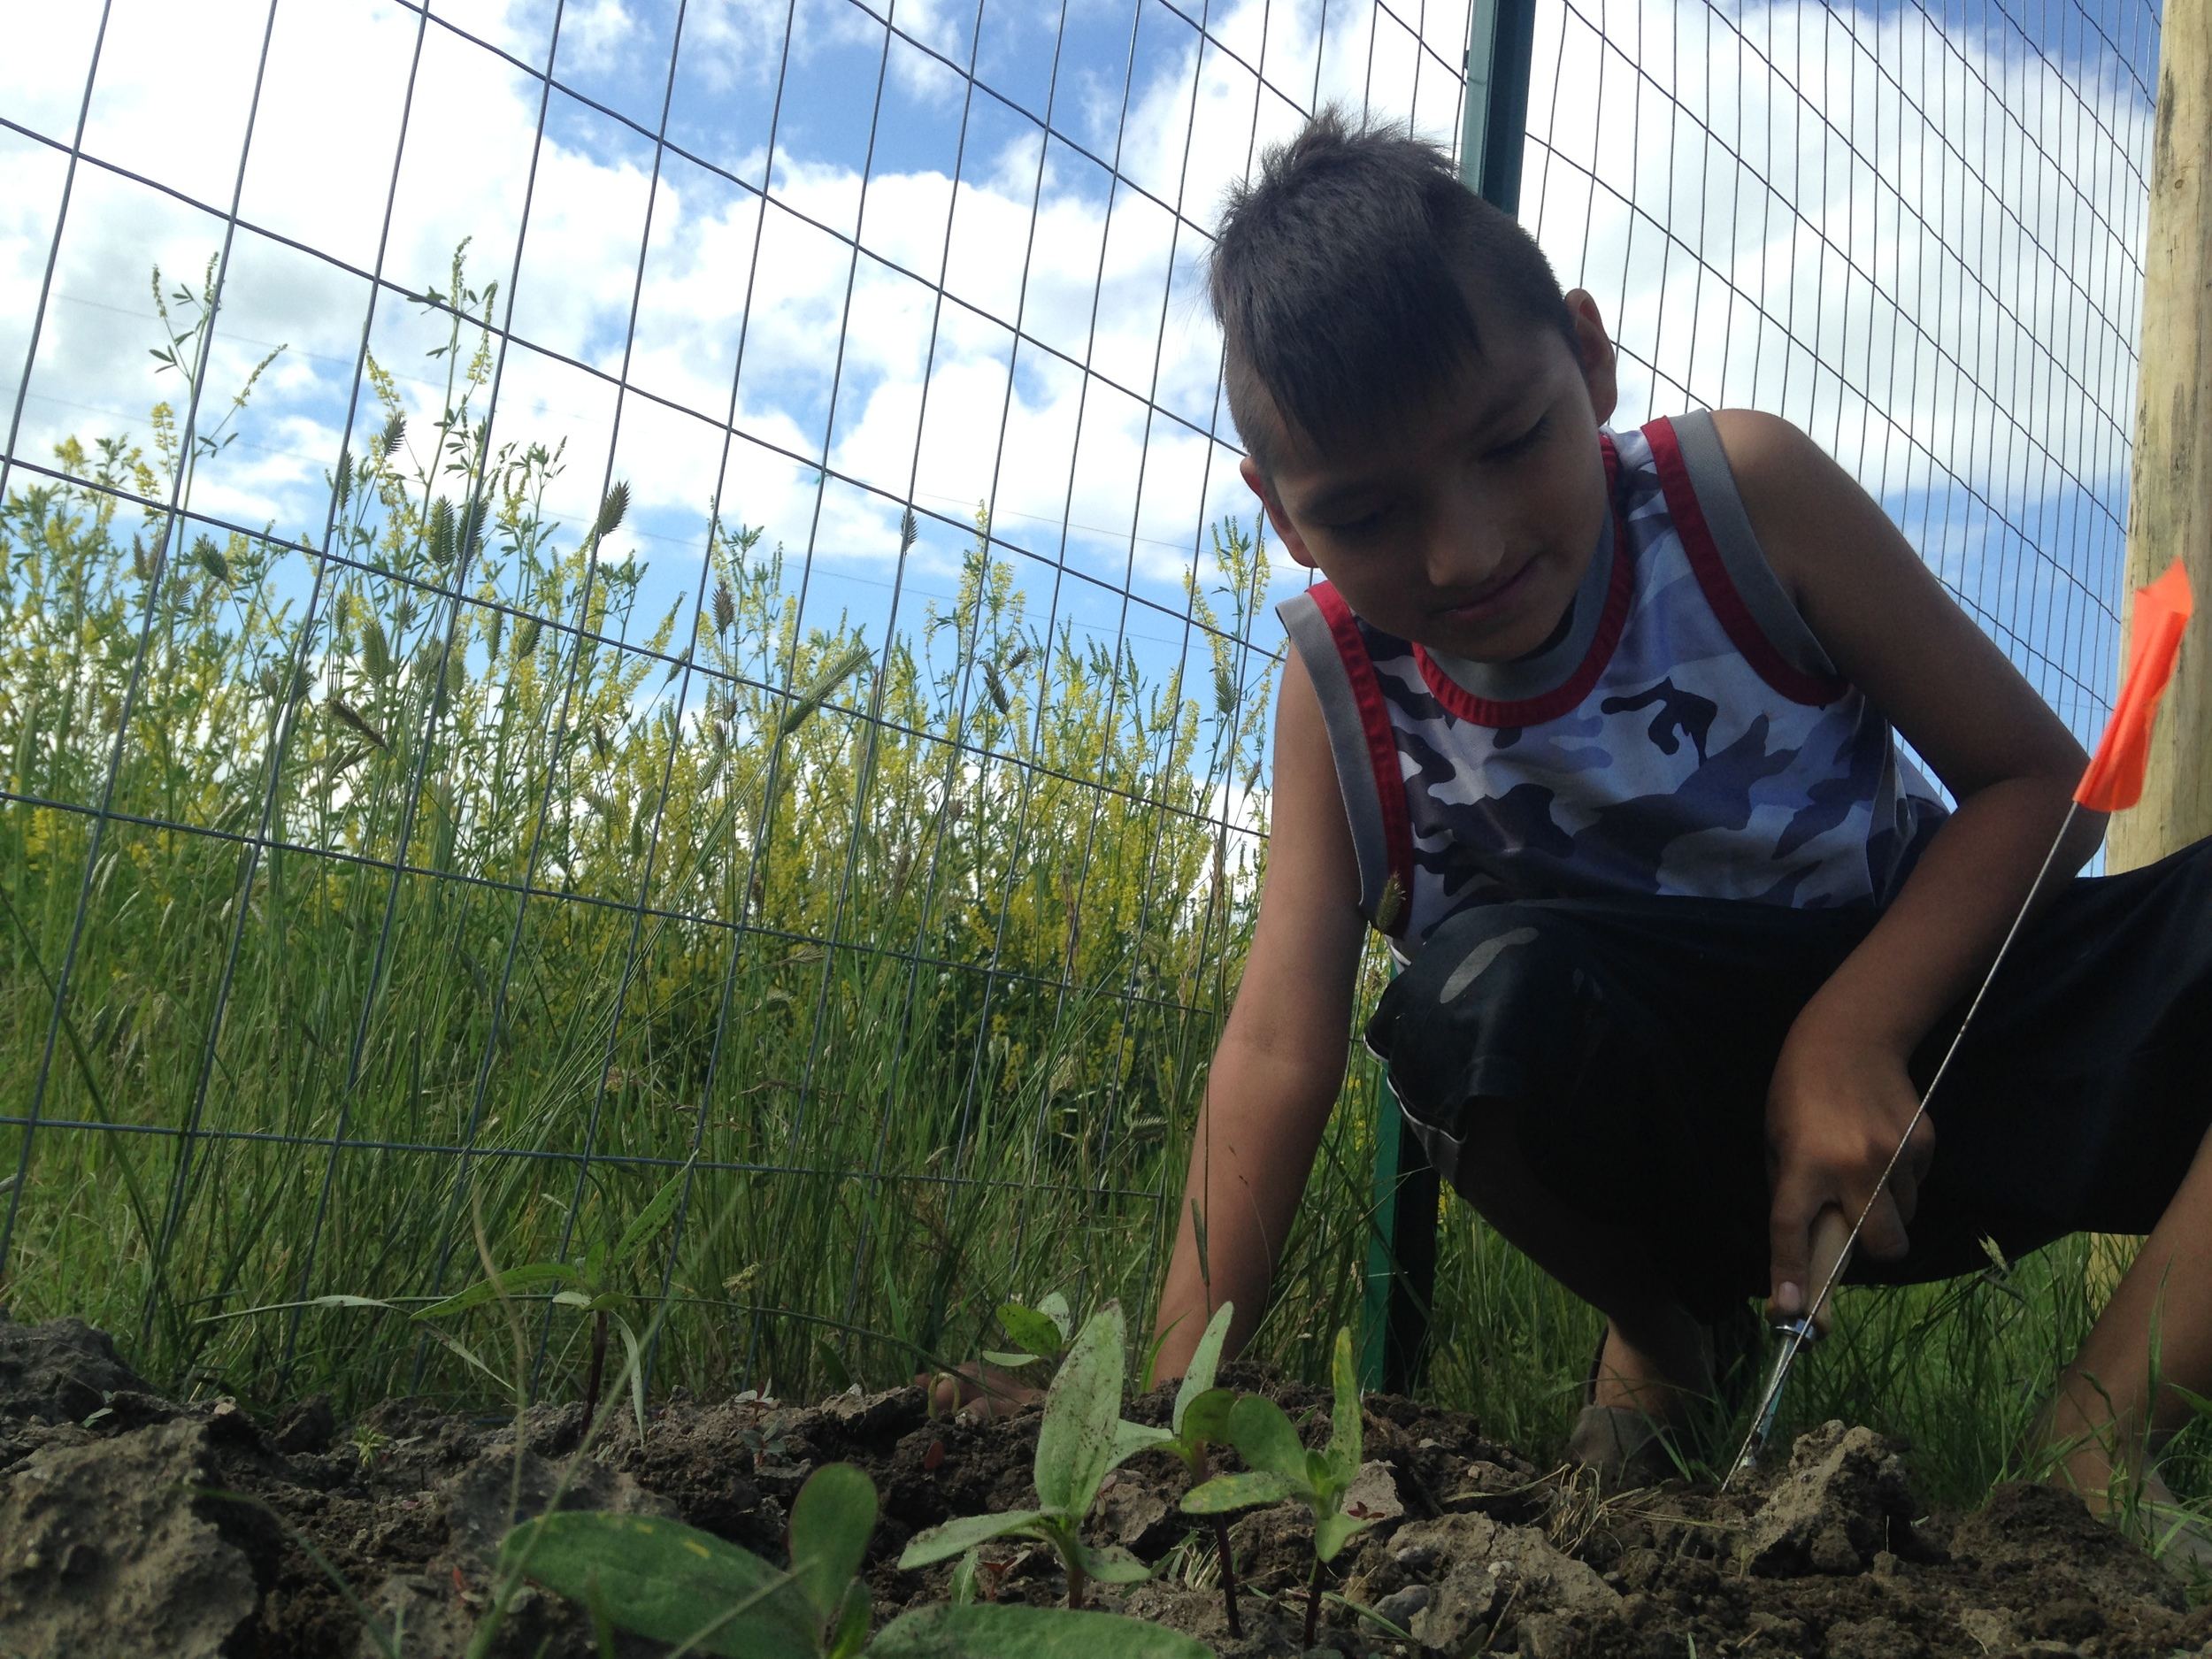 Weeding the sunflowers! (June 2014, A. Gross)